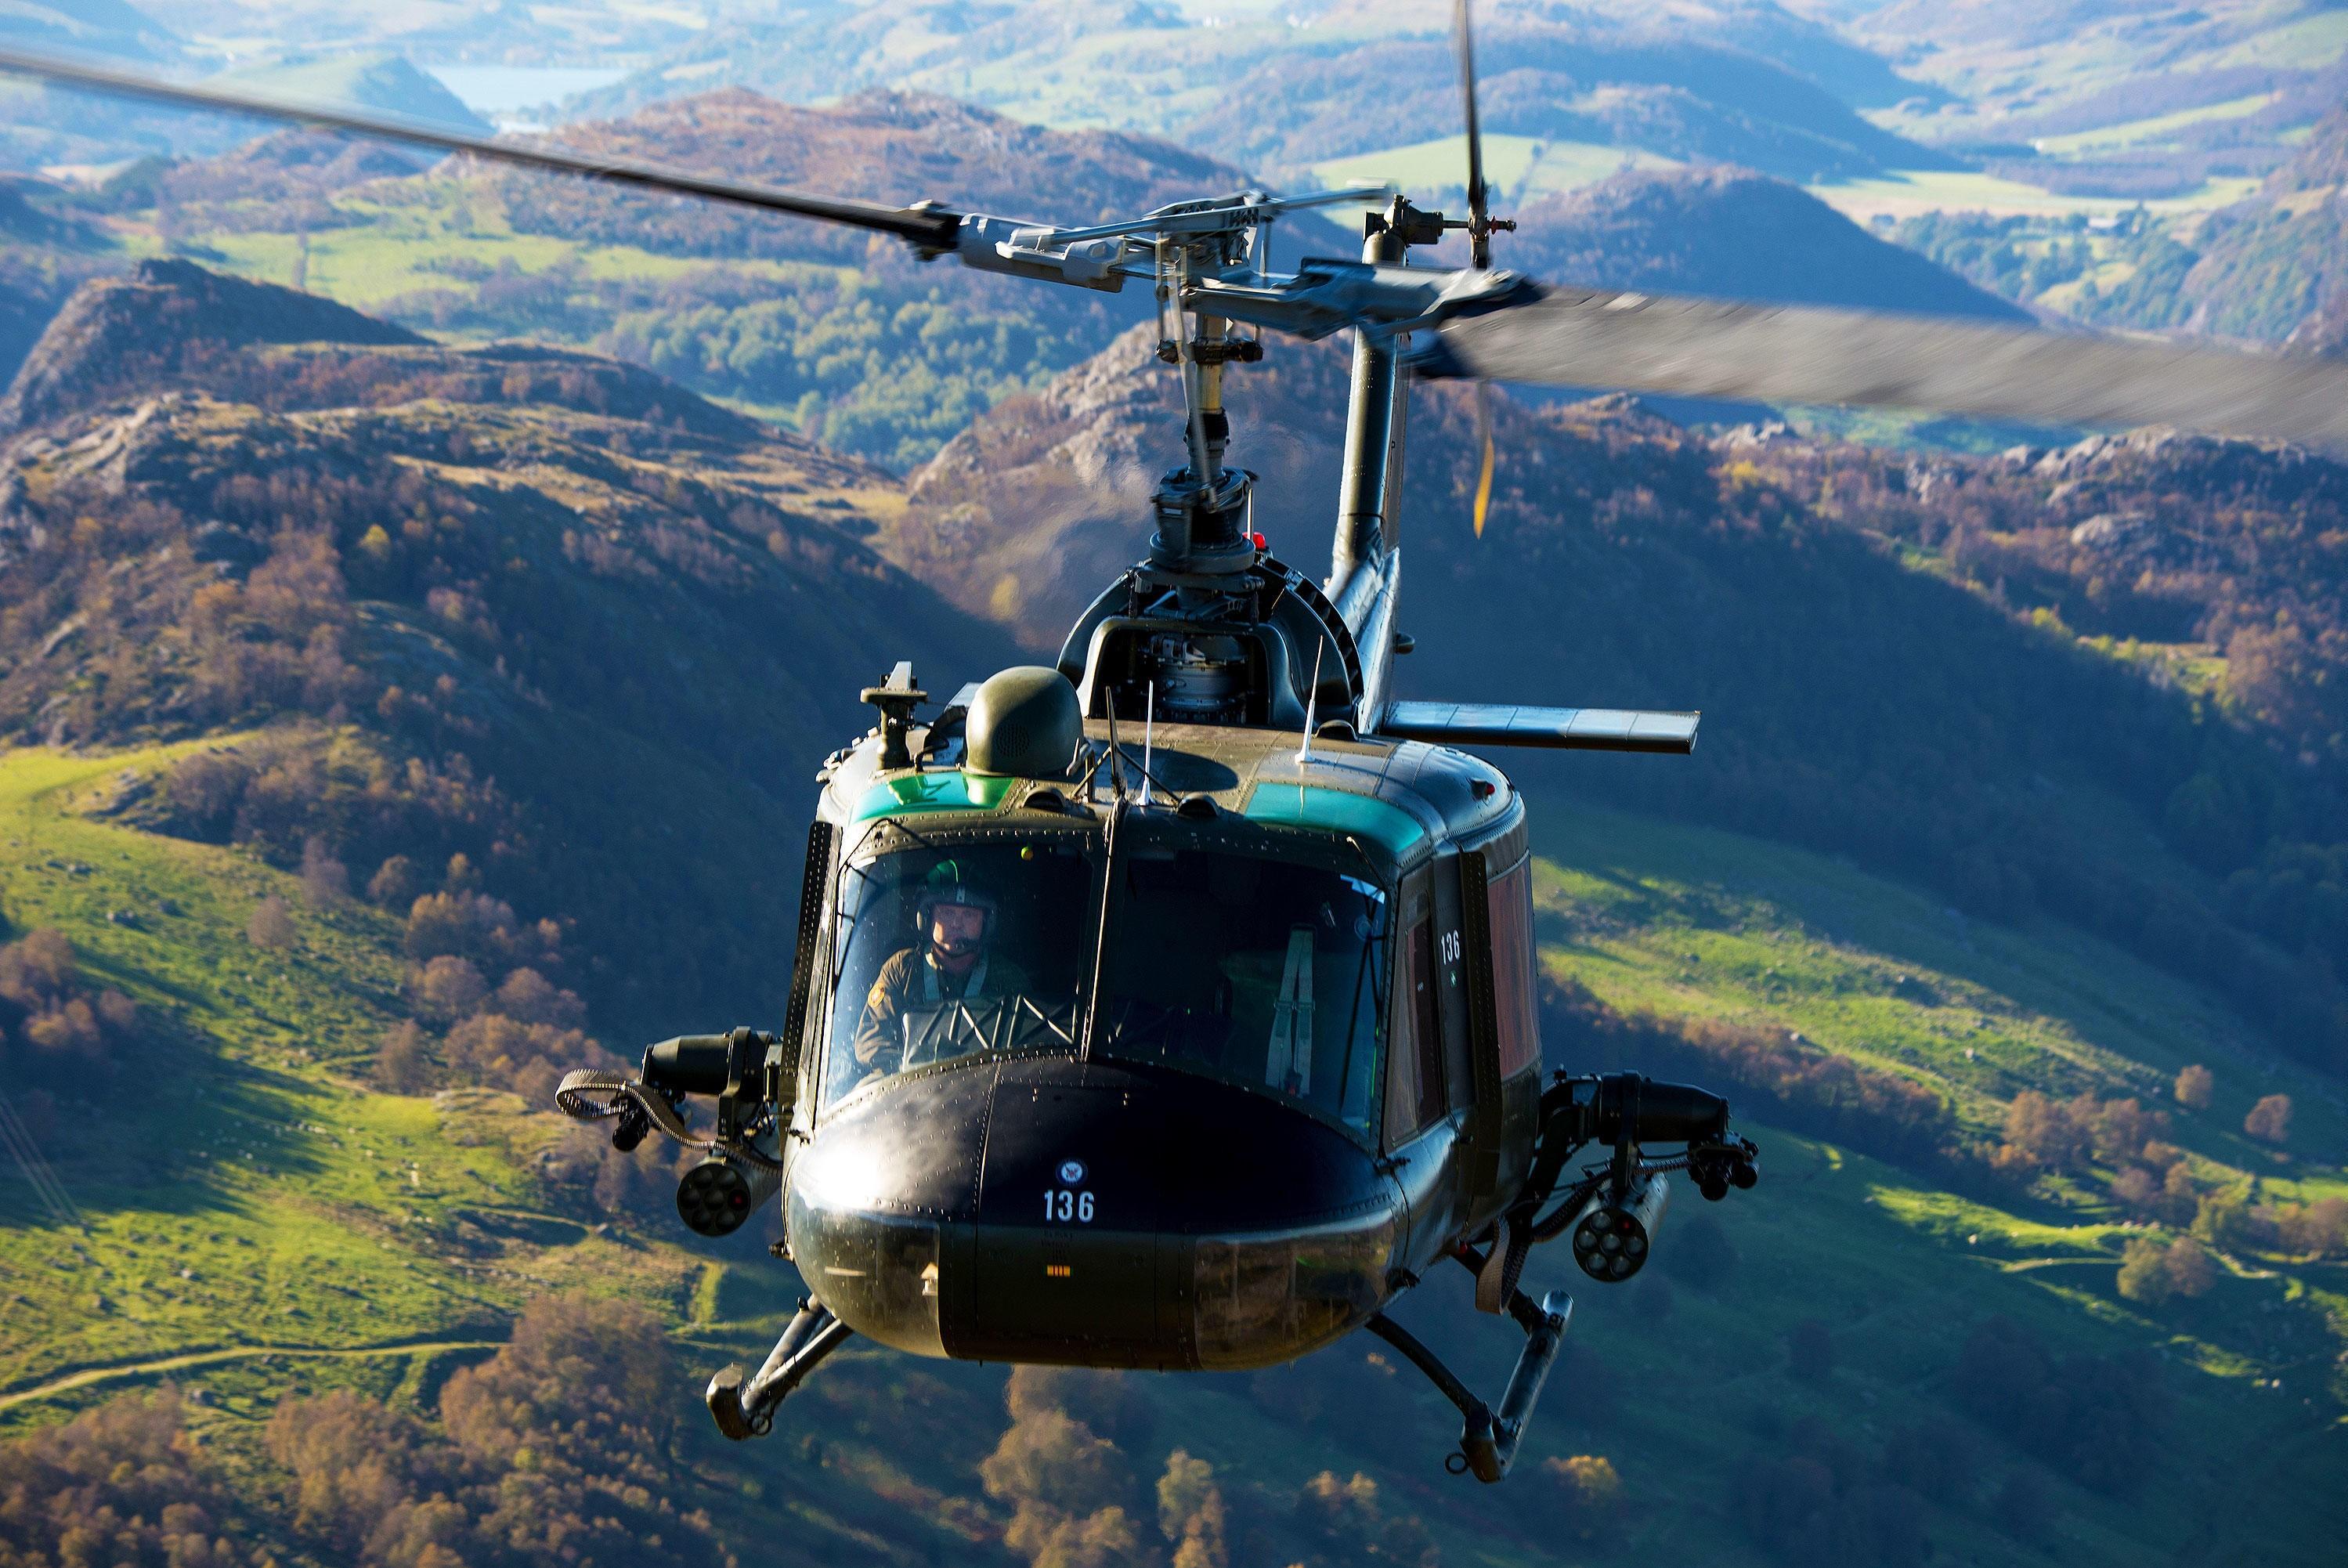 STRIDSTESTET: Huey-kamphelikopteret Stig Bakke flyr over Jæren har faktisk tjenestegjort i Vietnamkrigen.